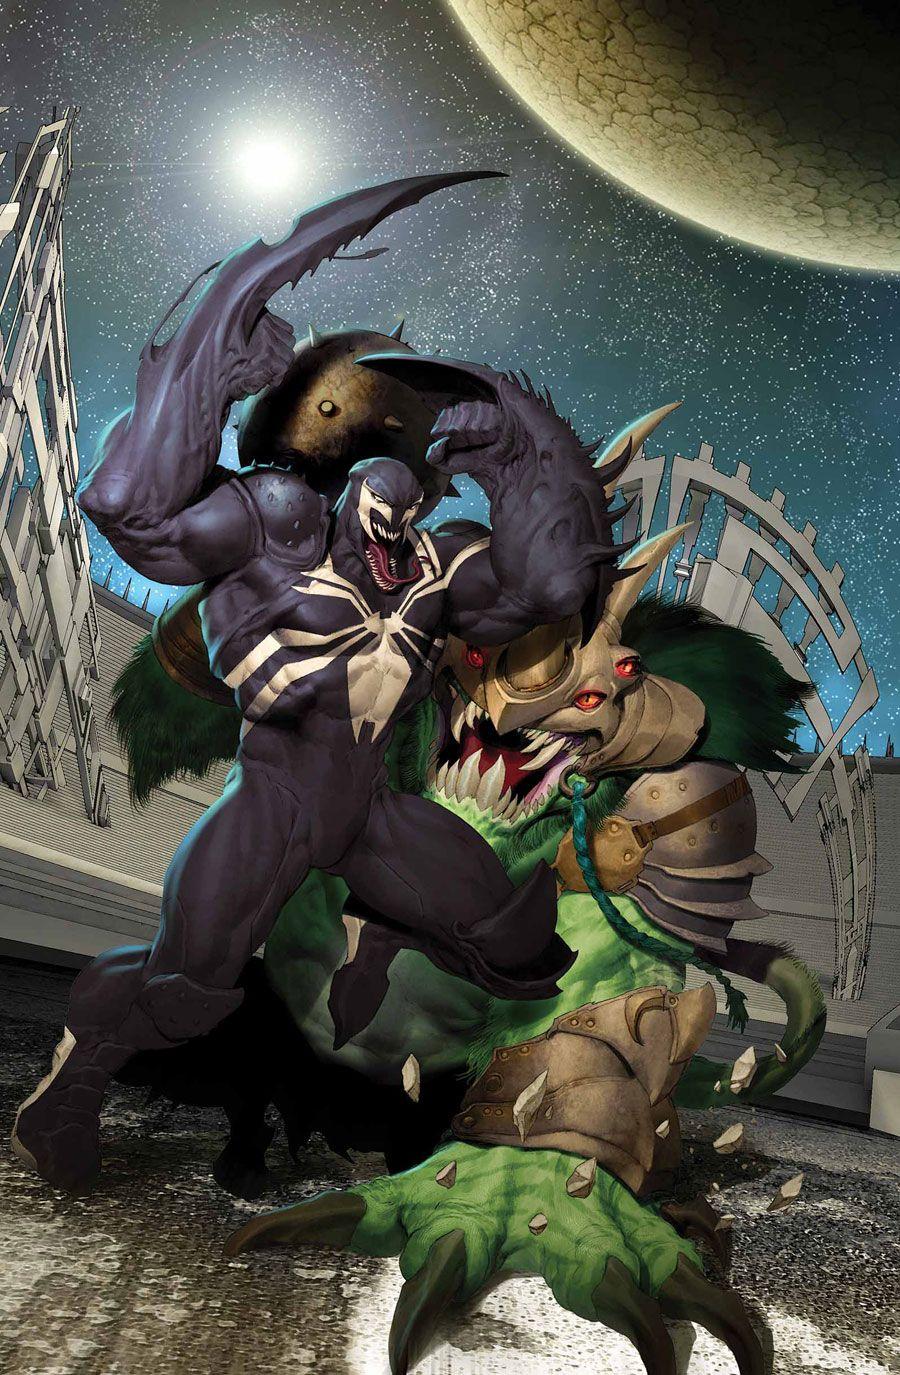 #Venom #Fan #Art. (Venom: Space Knight Vol.1 #4 Cover) By: Ariel Olivetti. (THE * 5 * STÅR * ÅWARD * OF: * AW YEAH, IT'S MAJOR ÅWESOMENESS!!!™)[THANK Ü 4 PINNING!!!<·><]<©>ÅÅÅ+(OB4E)